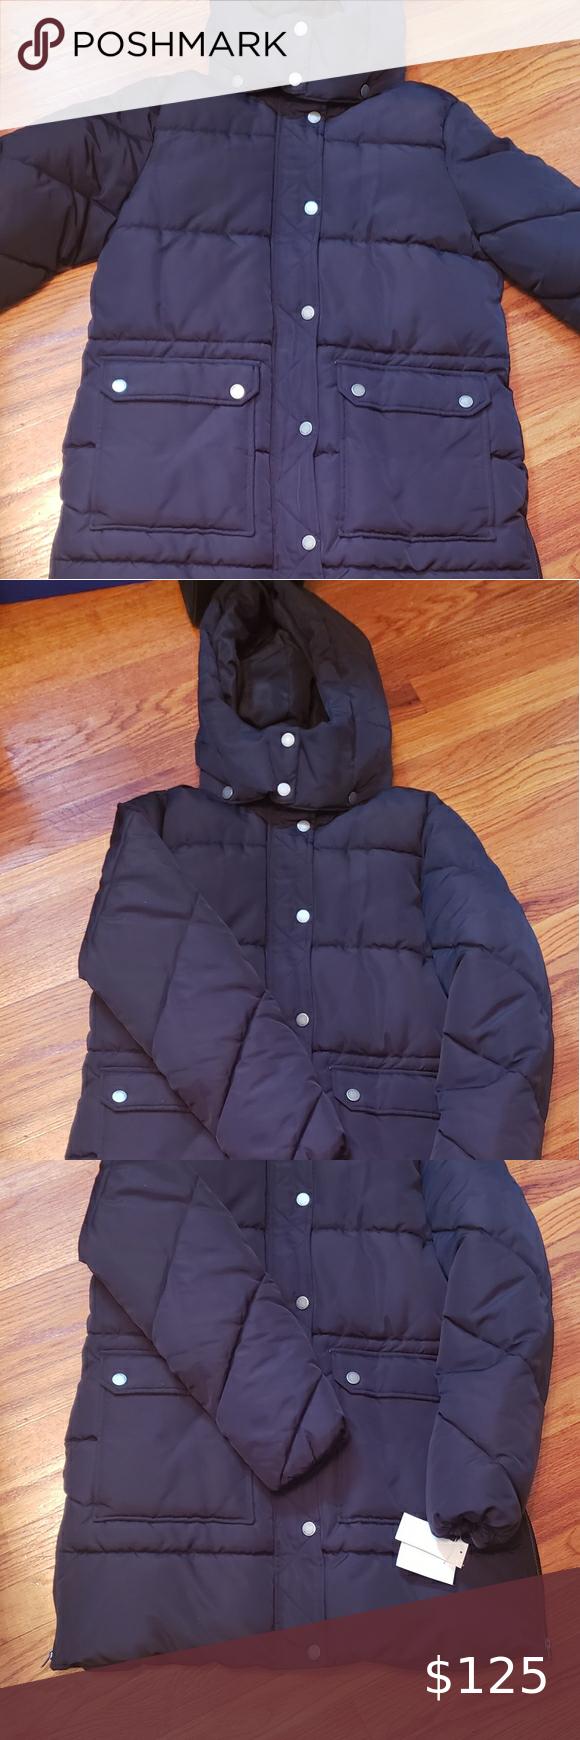 Lucky Brand 2 Pocket Puffer Coat Black Medium Plus Size Nwt Warm Lucky Brand Jackets Coats Puffers Puffer Coat Lucky Brand Red Puffer Jacket [ 1740 x 580 Pixel ]